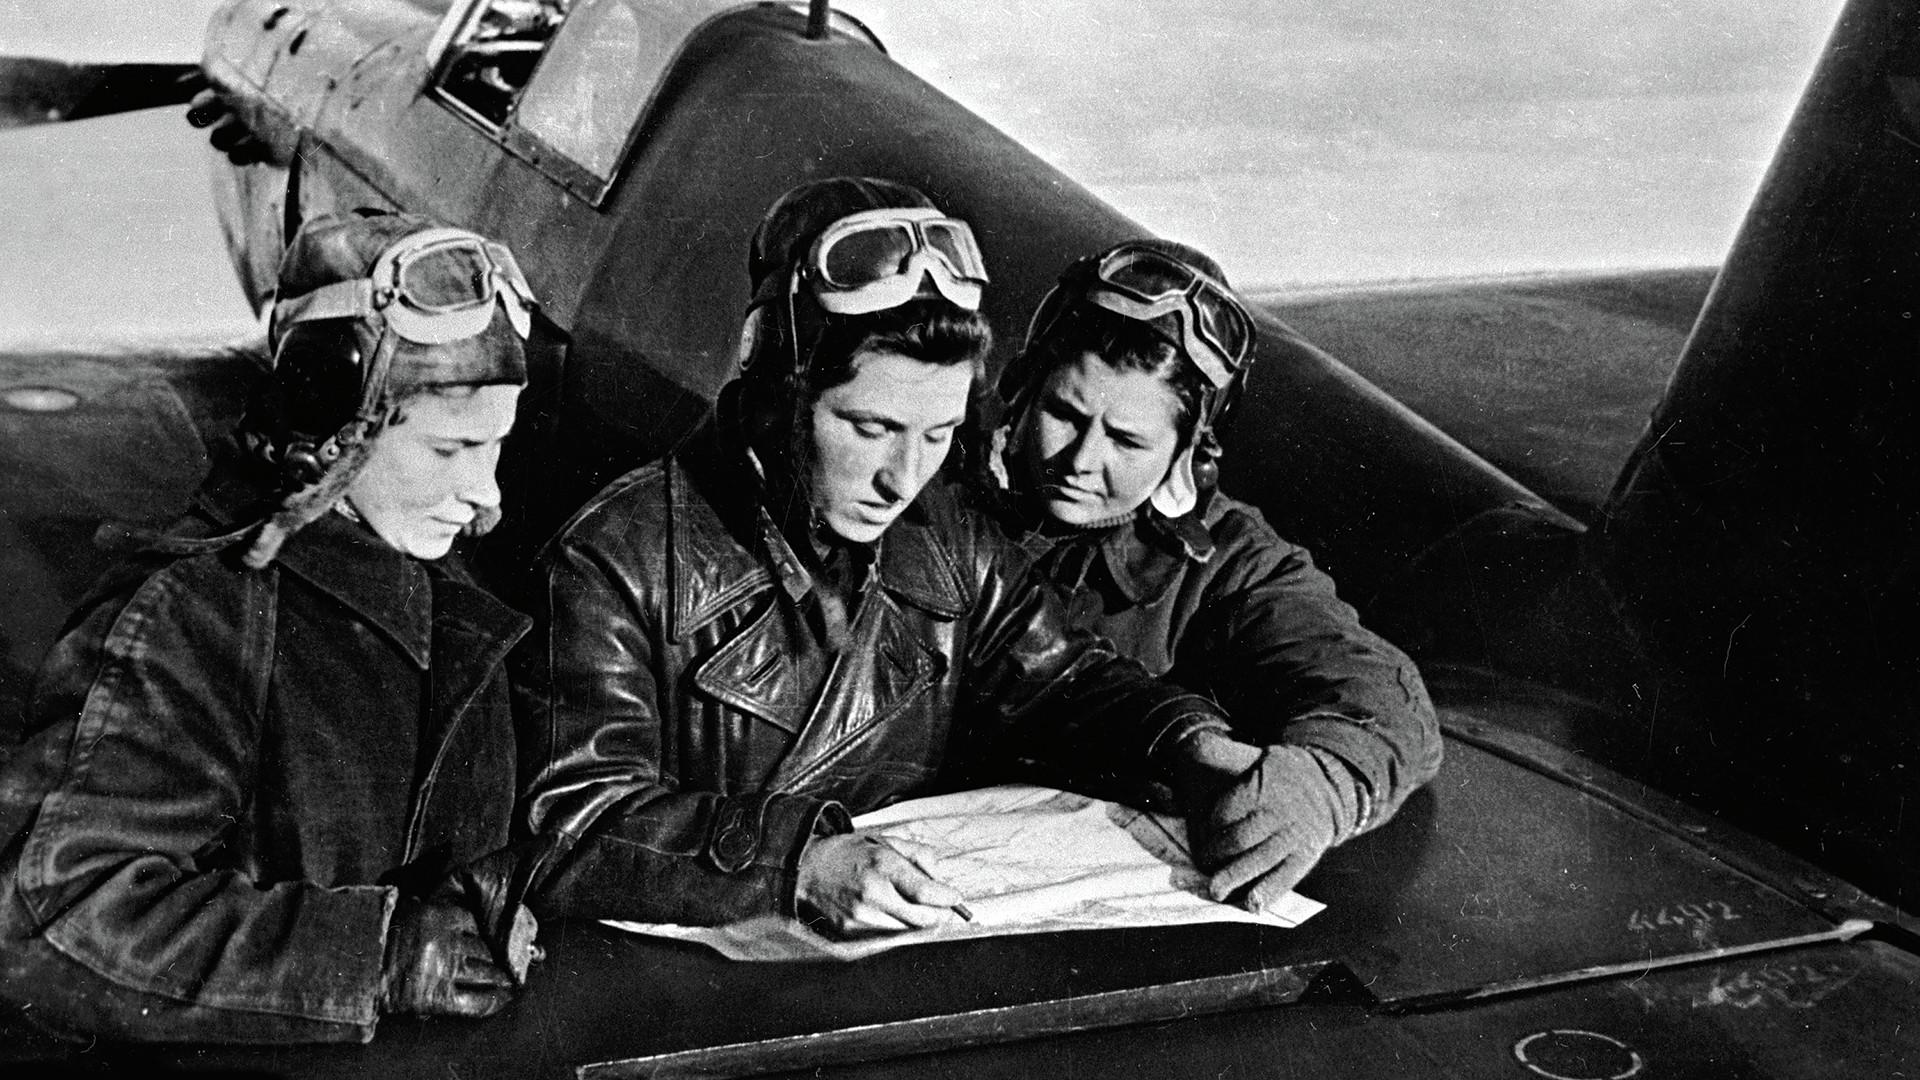 Litviak, Budánova and Kuznetsova junto al avión  Yak-1.